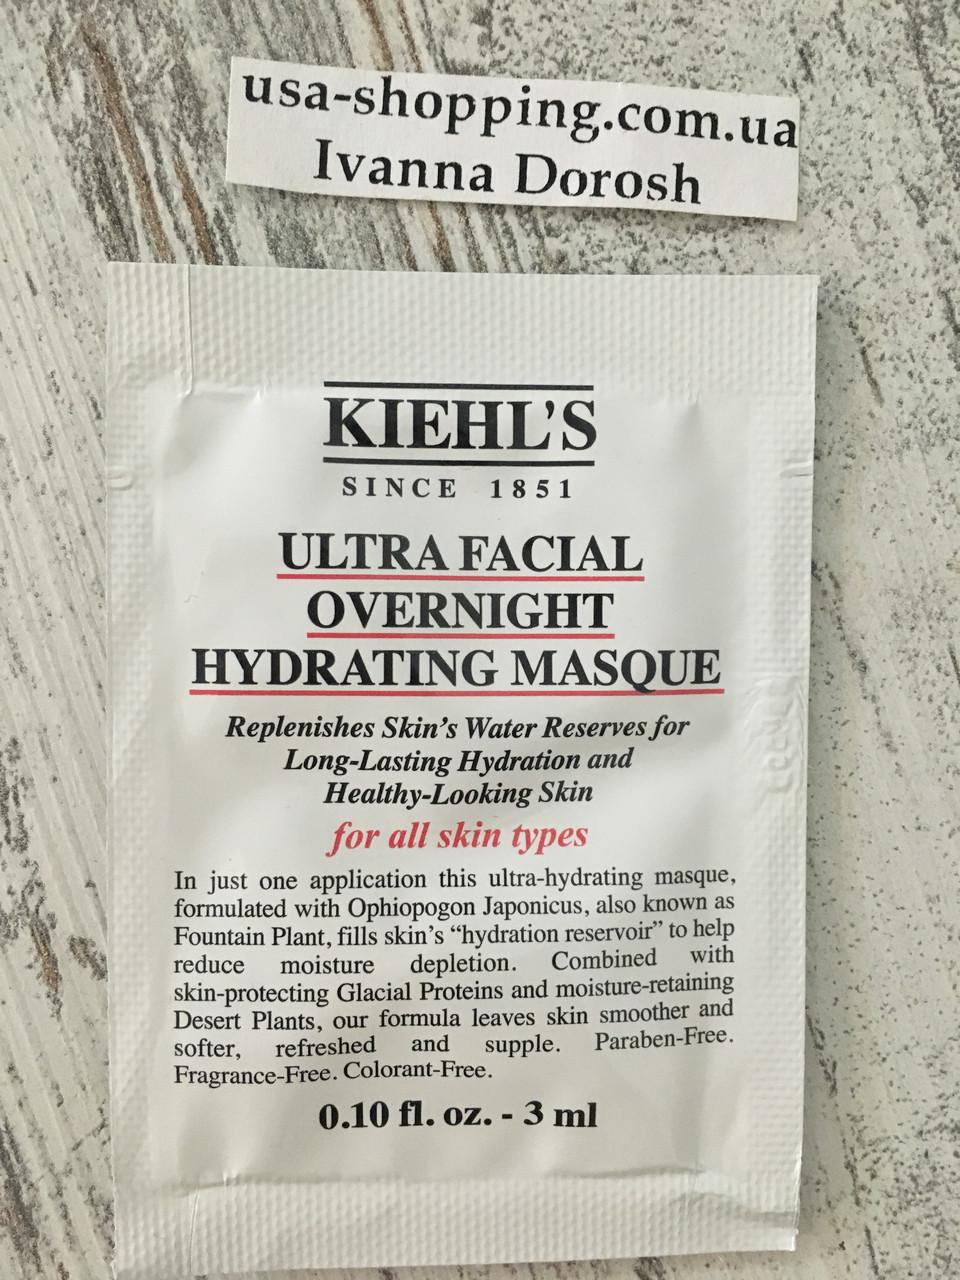 Kiehl's Интенсивно увлажняющая ночная маска для лица